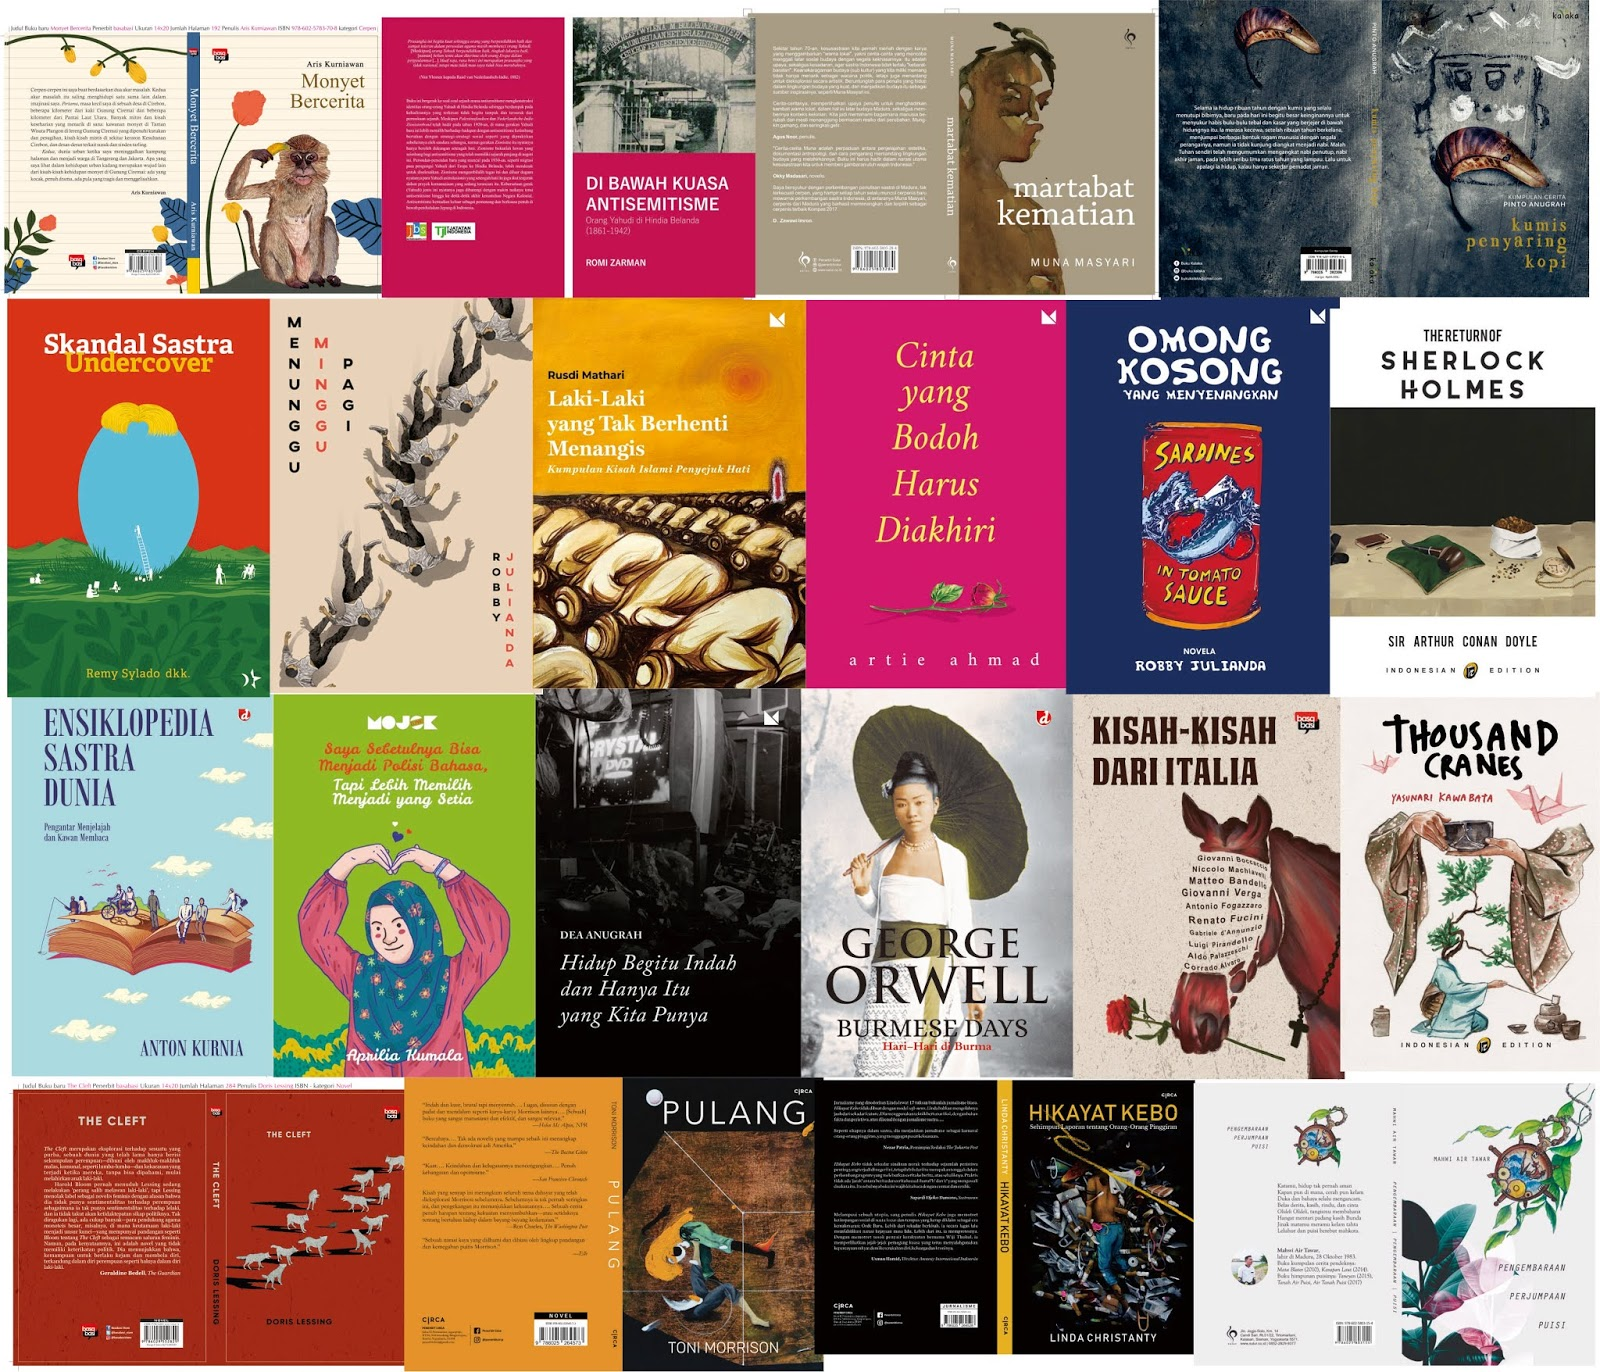 Jualan Buku Sastra  Katalog Sastra Februari 2019 b73704acfd